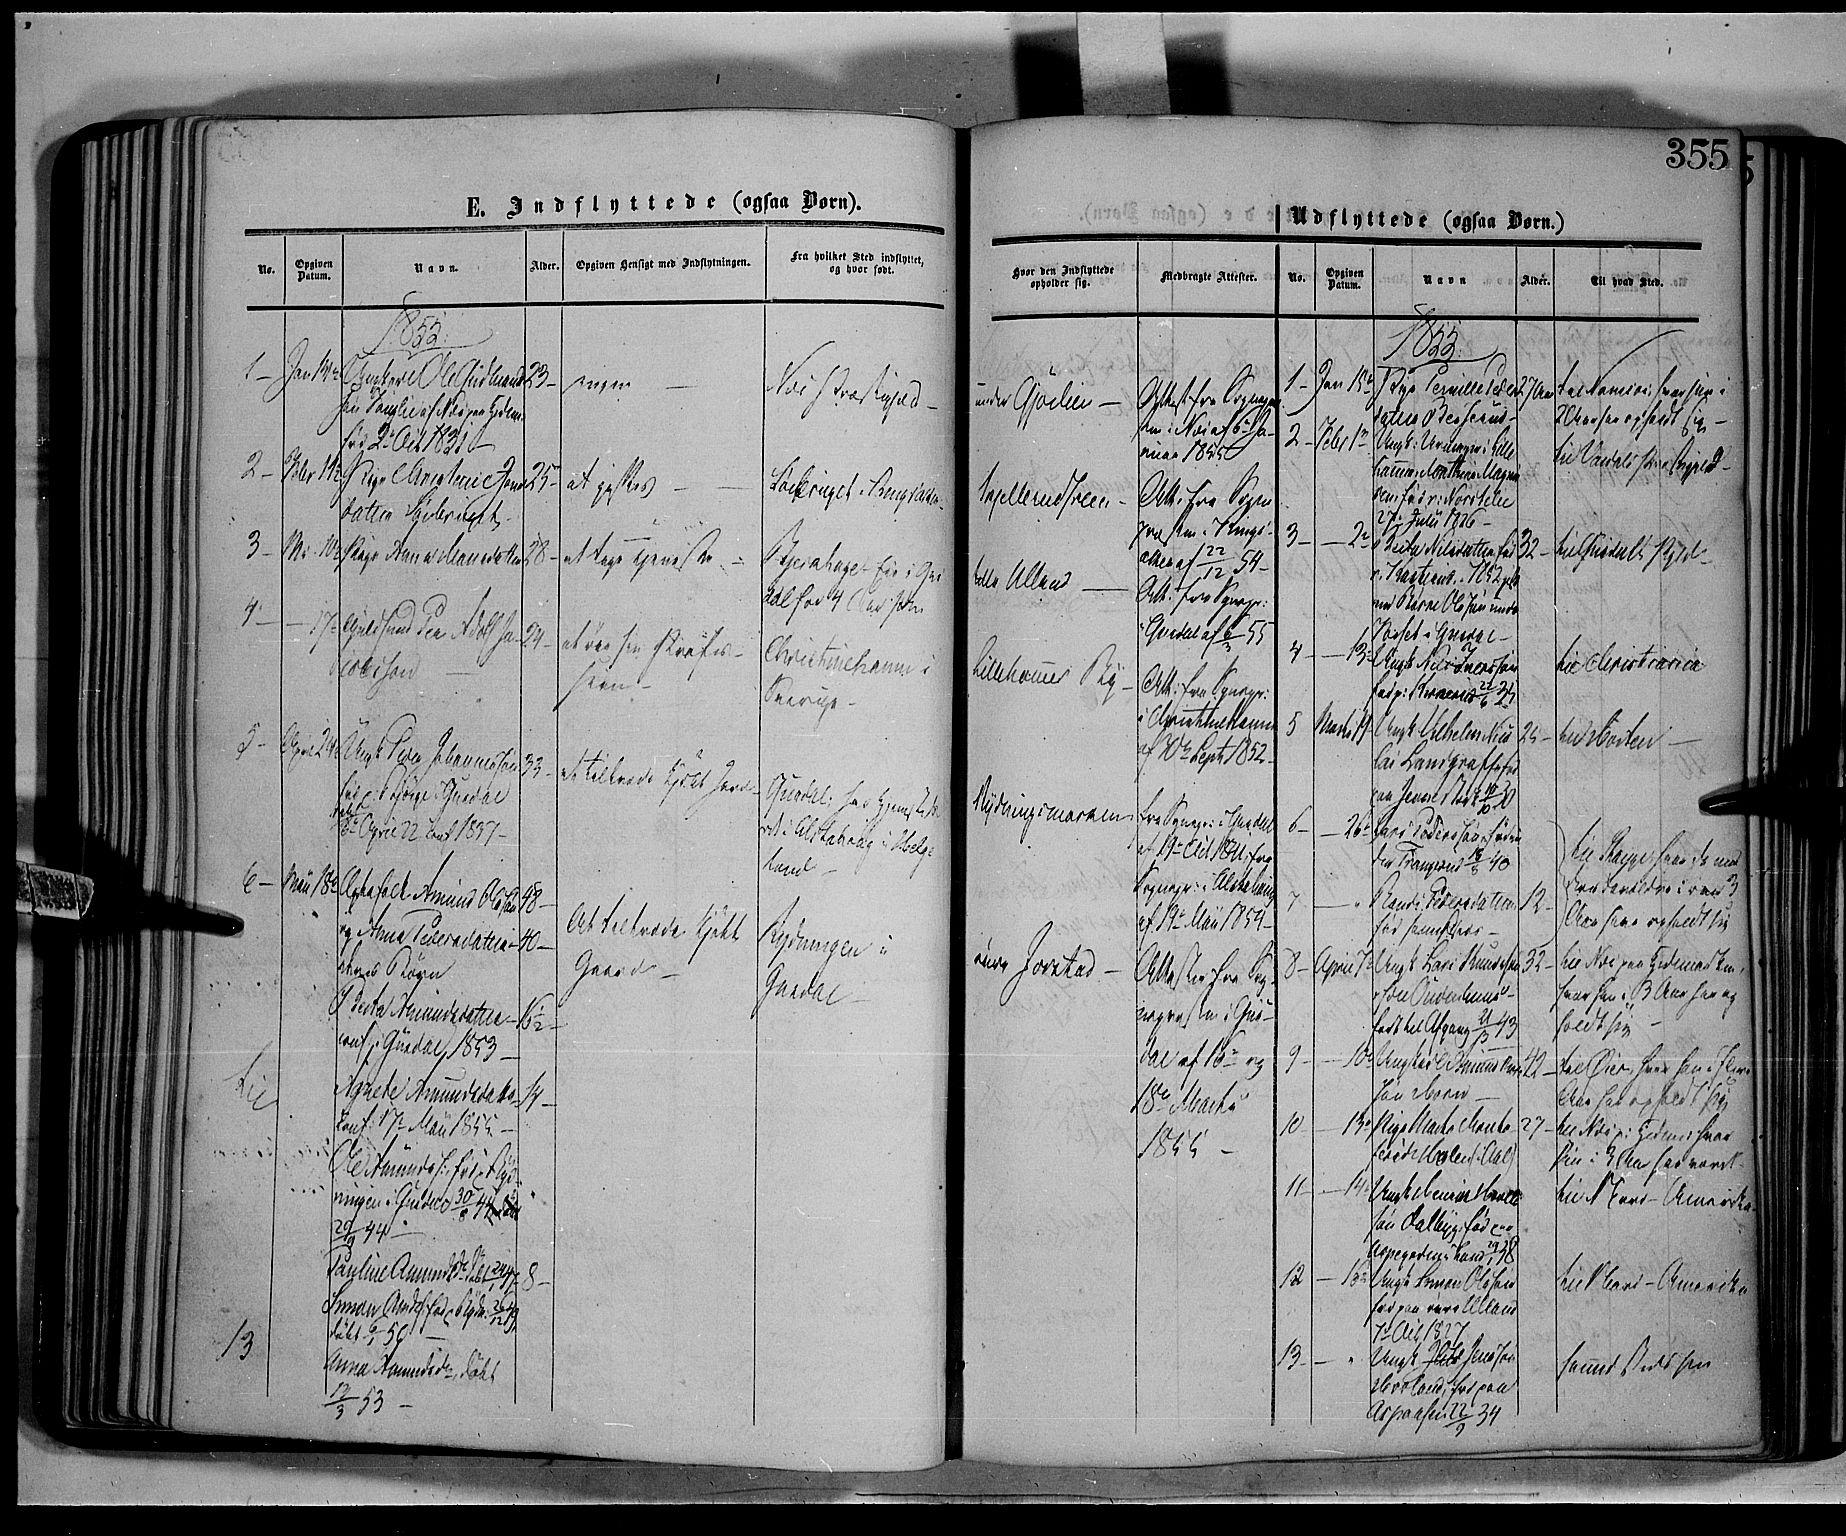 SAH, Fåberg prestekontor, Parish register (official) no. 6B, 1855-1867, p. 355